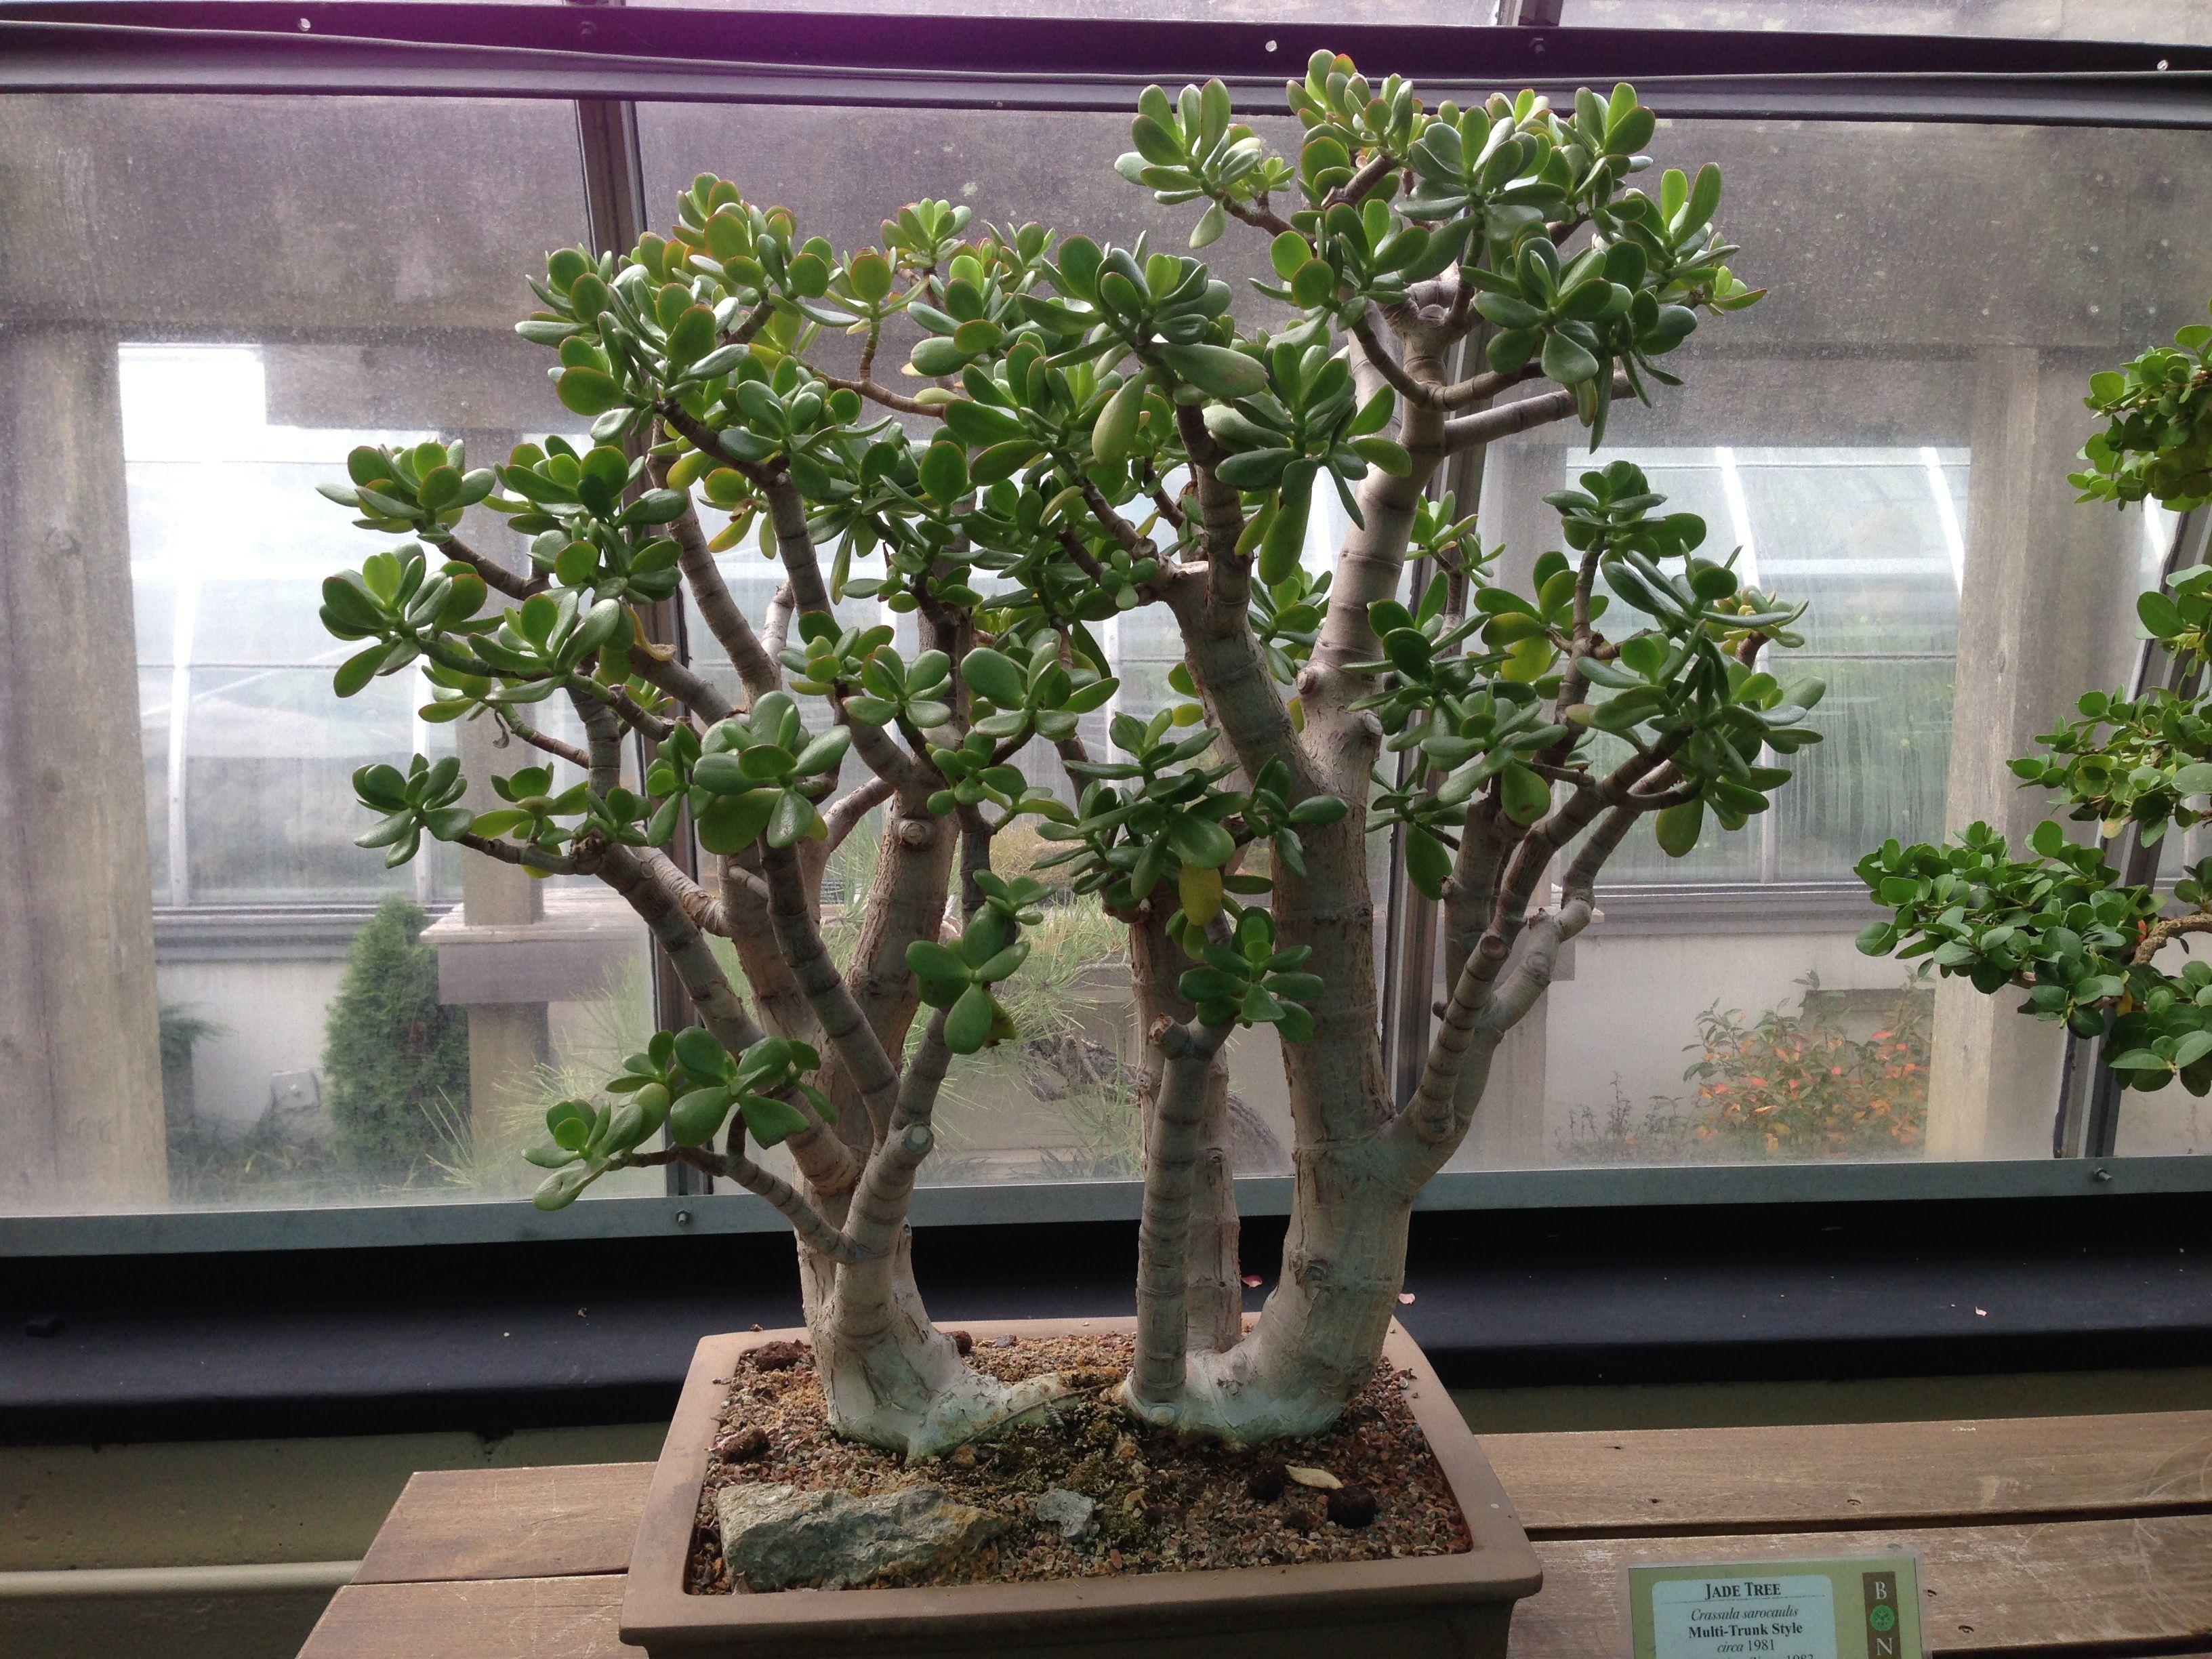 Jade Plants Jade Trees Make An Interesting Bonsai Bonsai Succulent Garden Diy Jade Plants